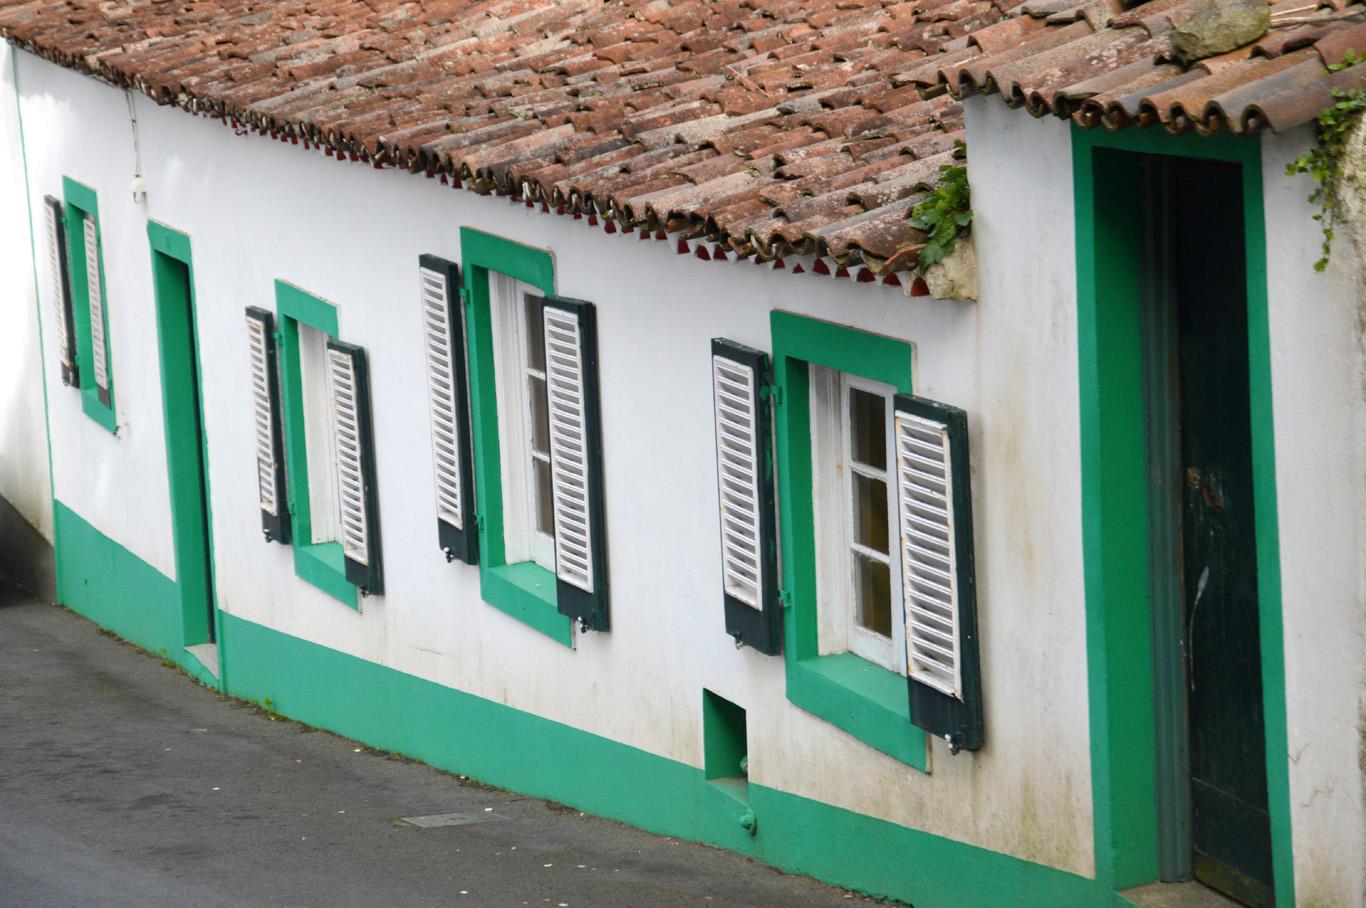 A village house in Nordeste